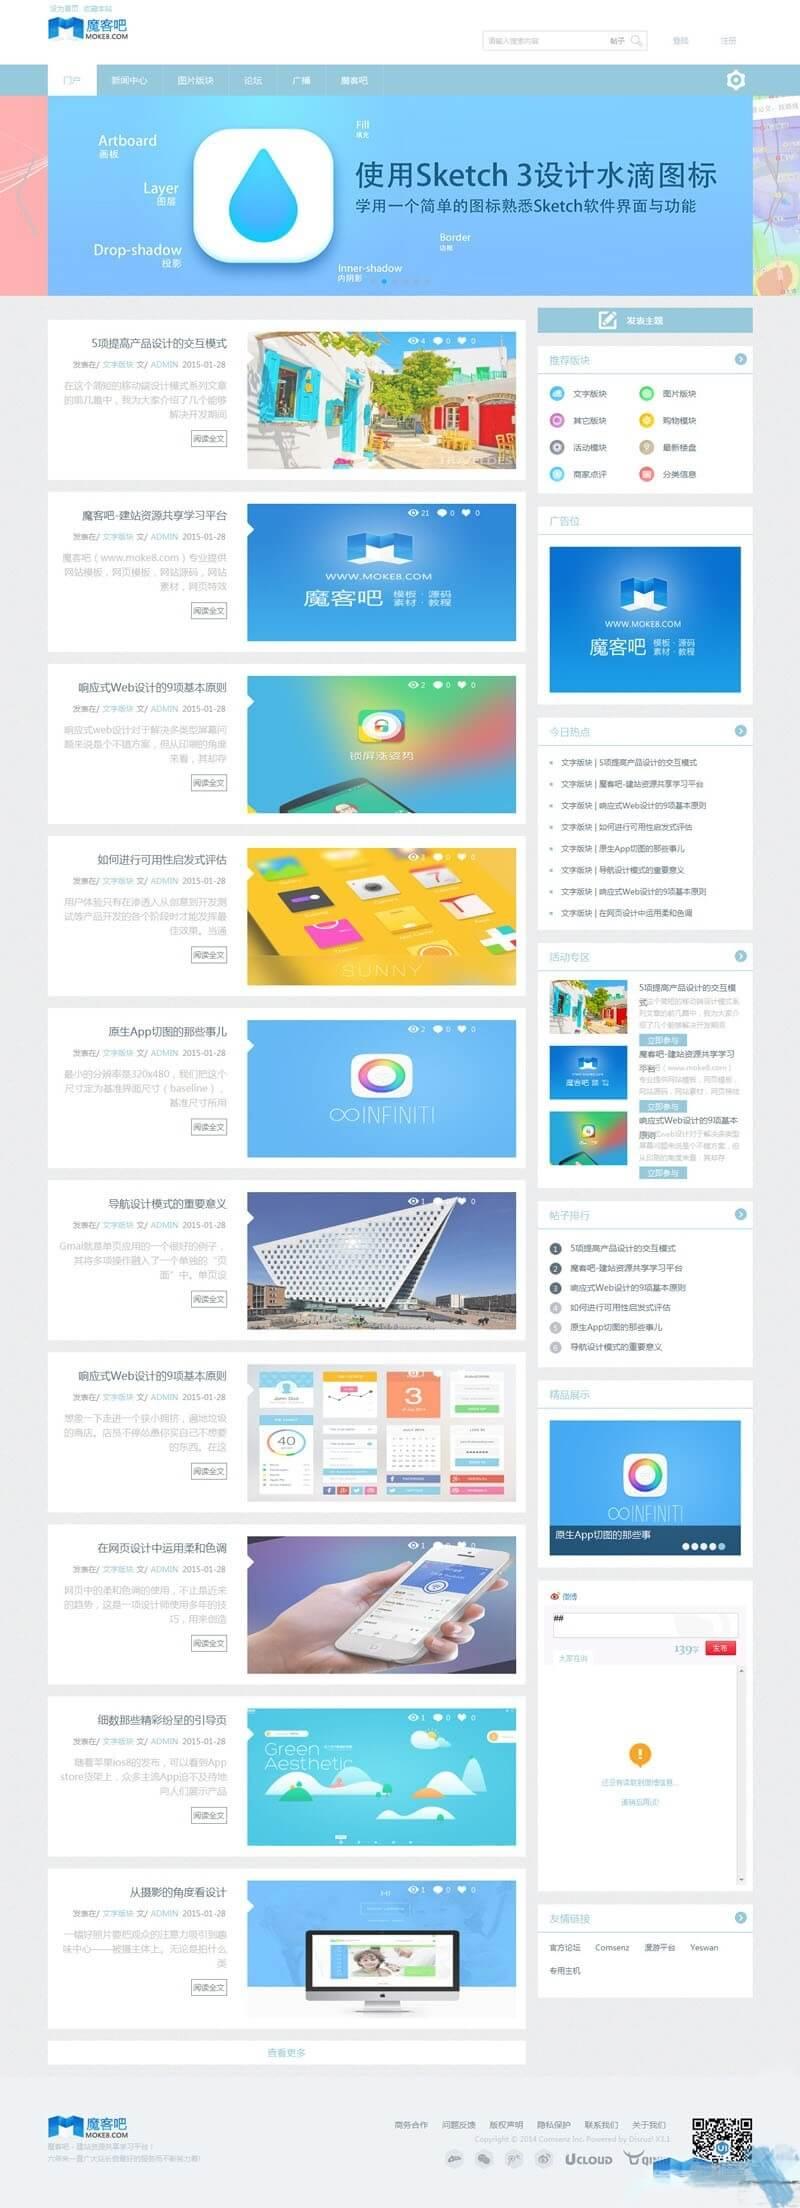 Discuz模板:大米社区博客风格免费分享